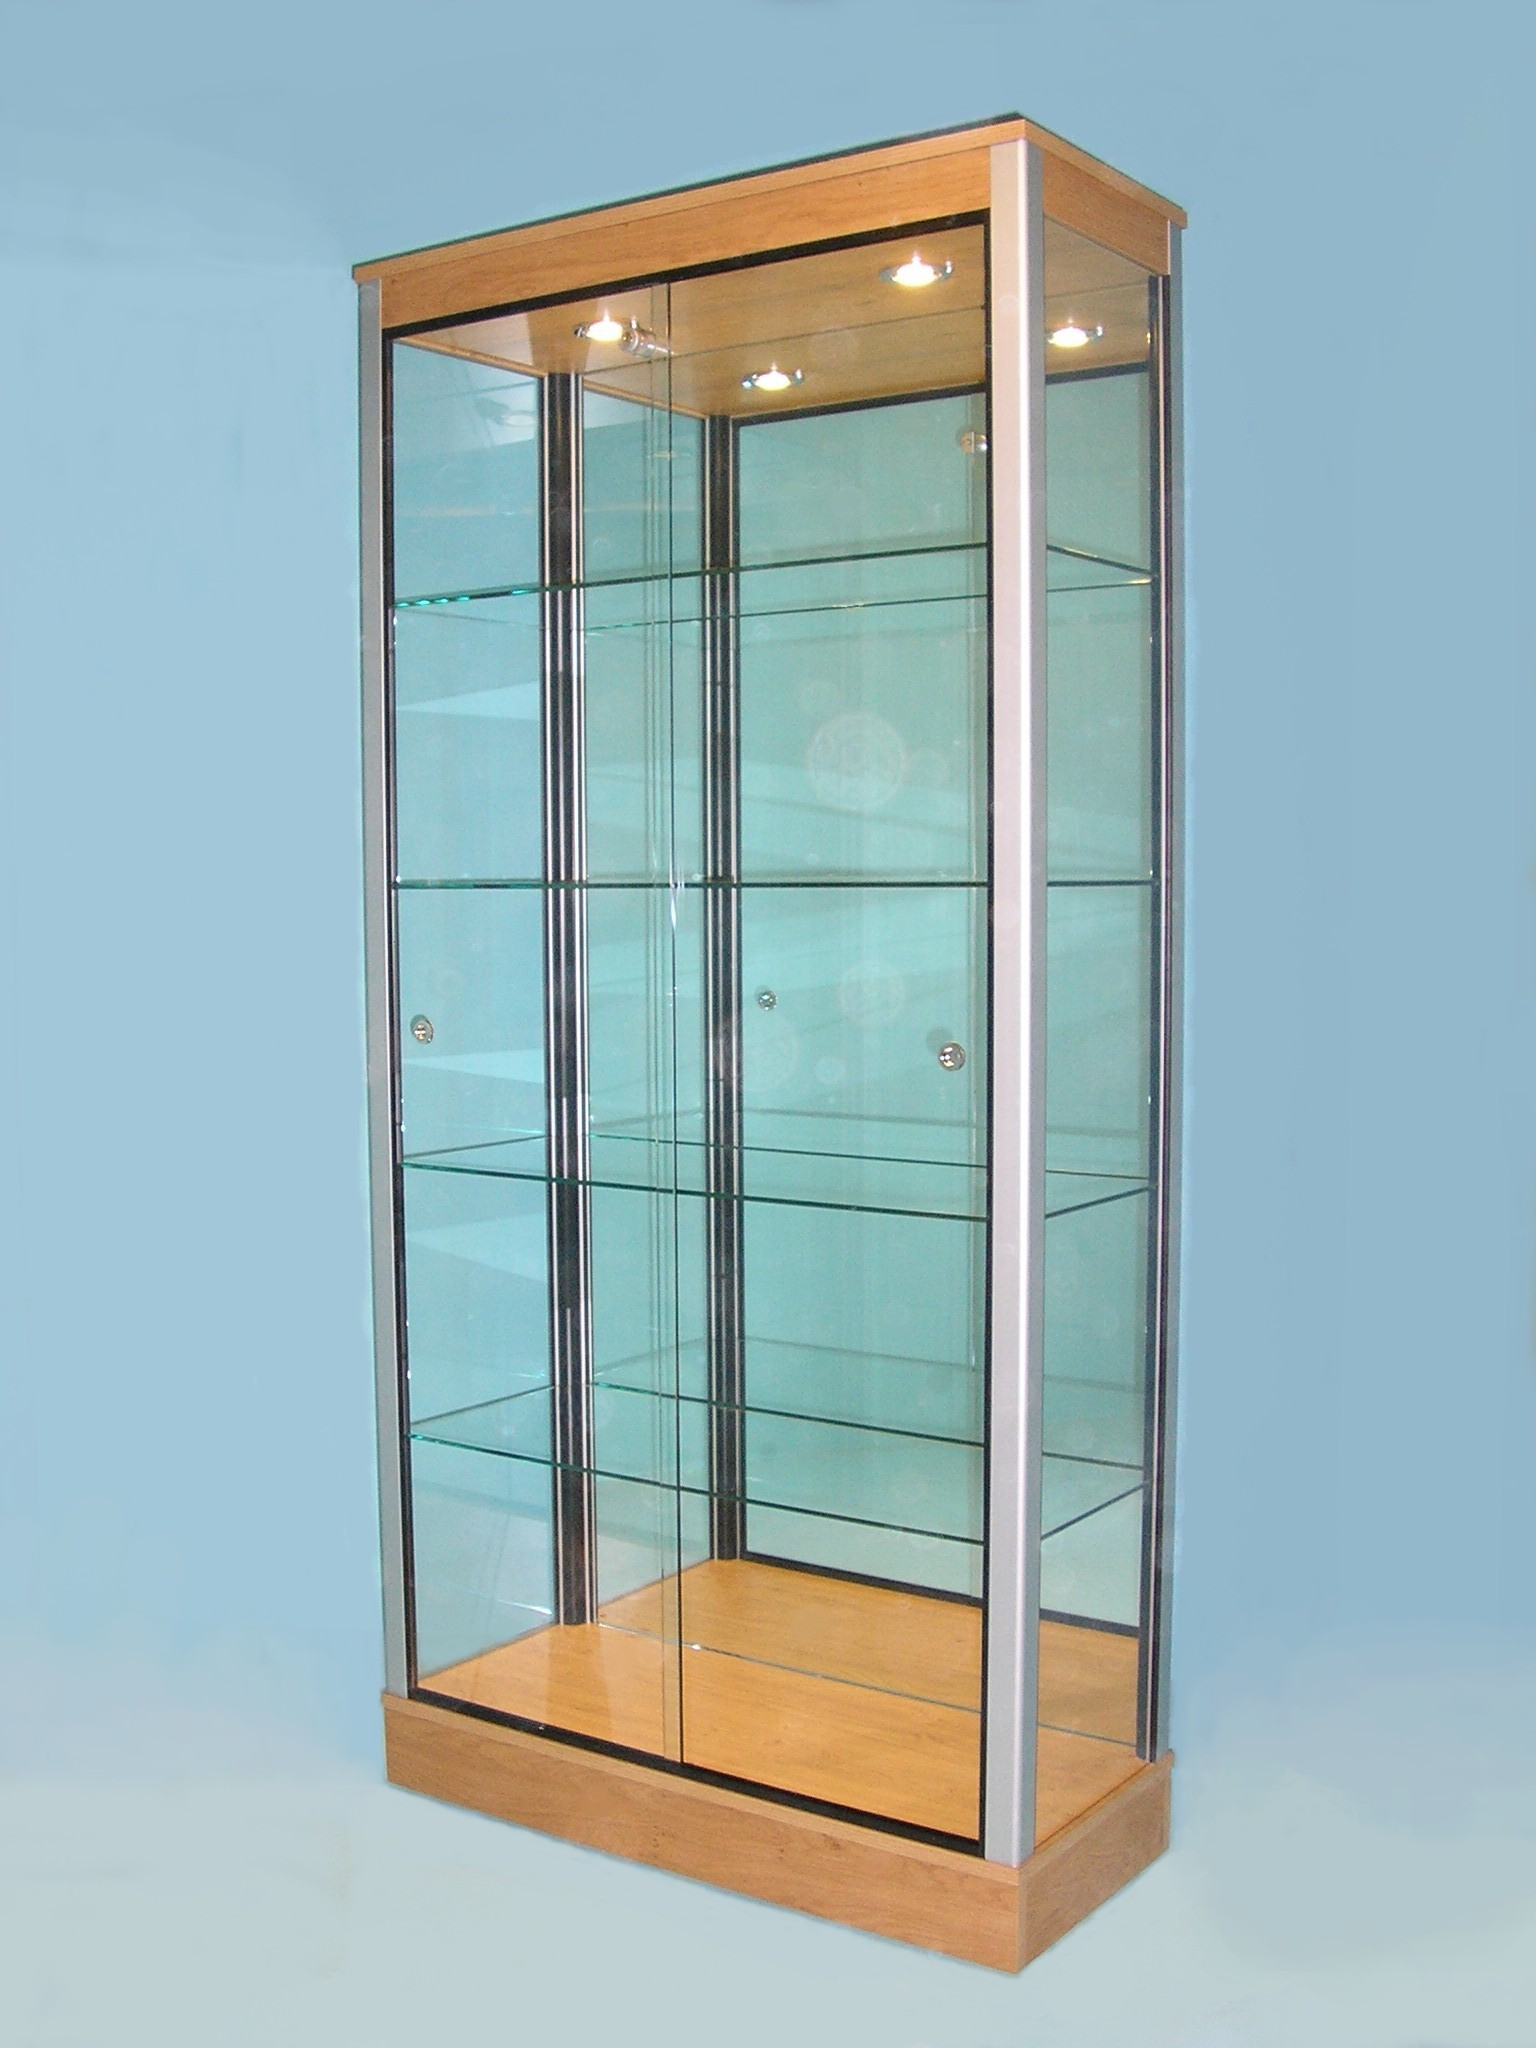 Designex Cabinets